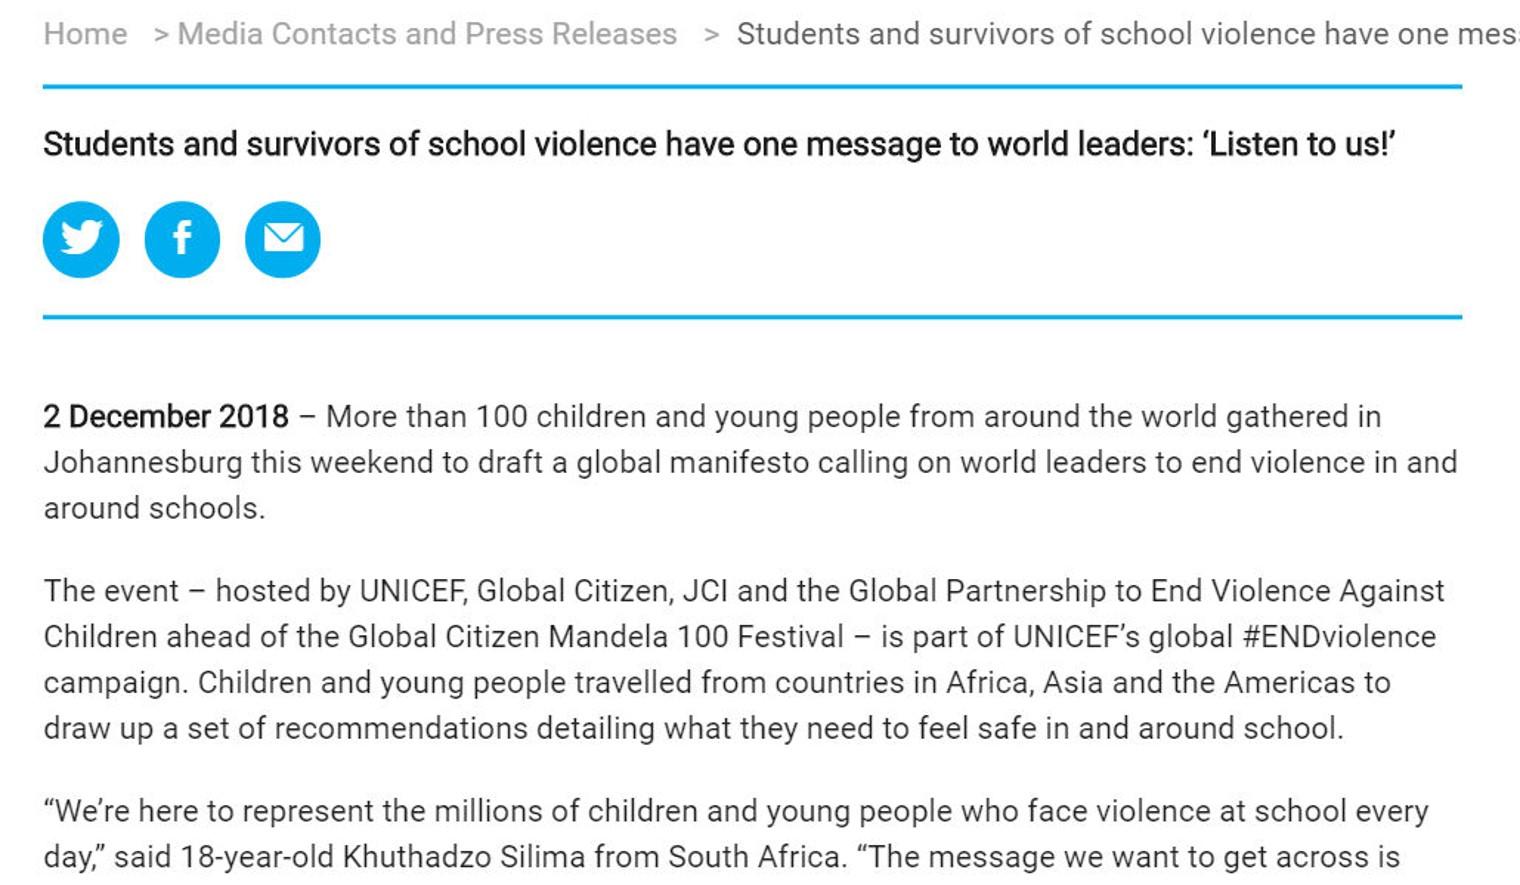 UNICEF press release